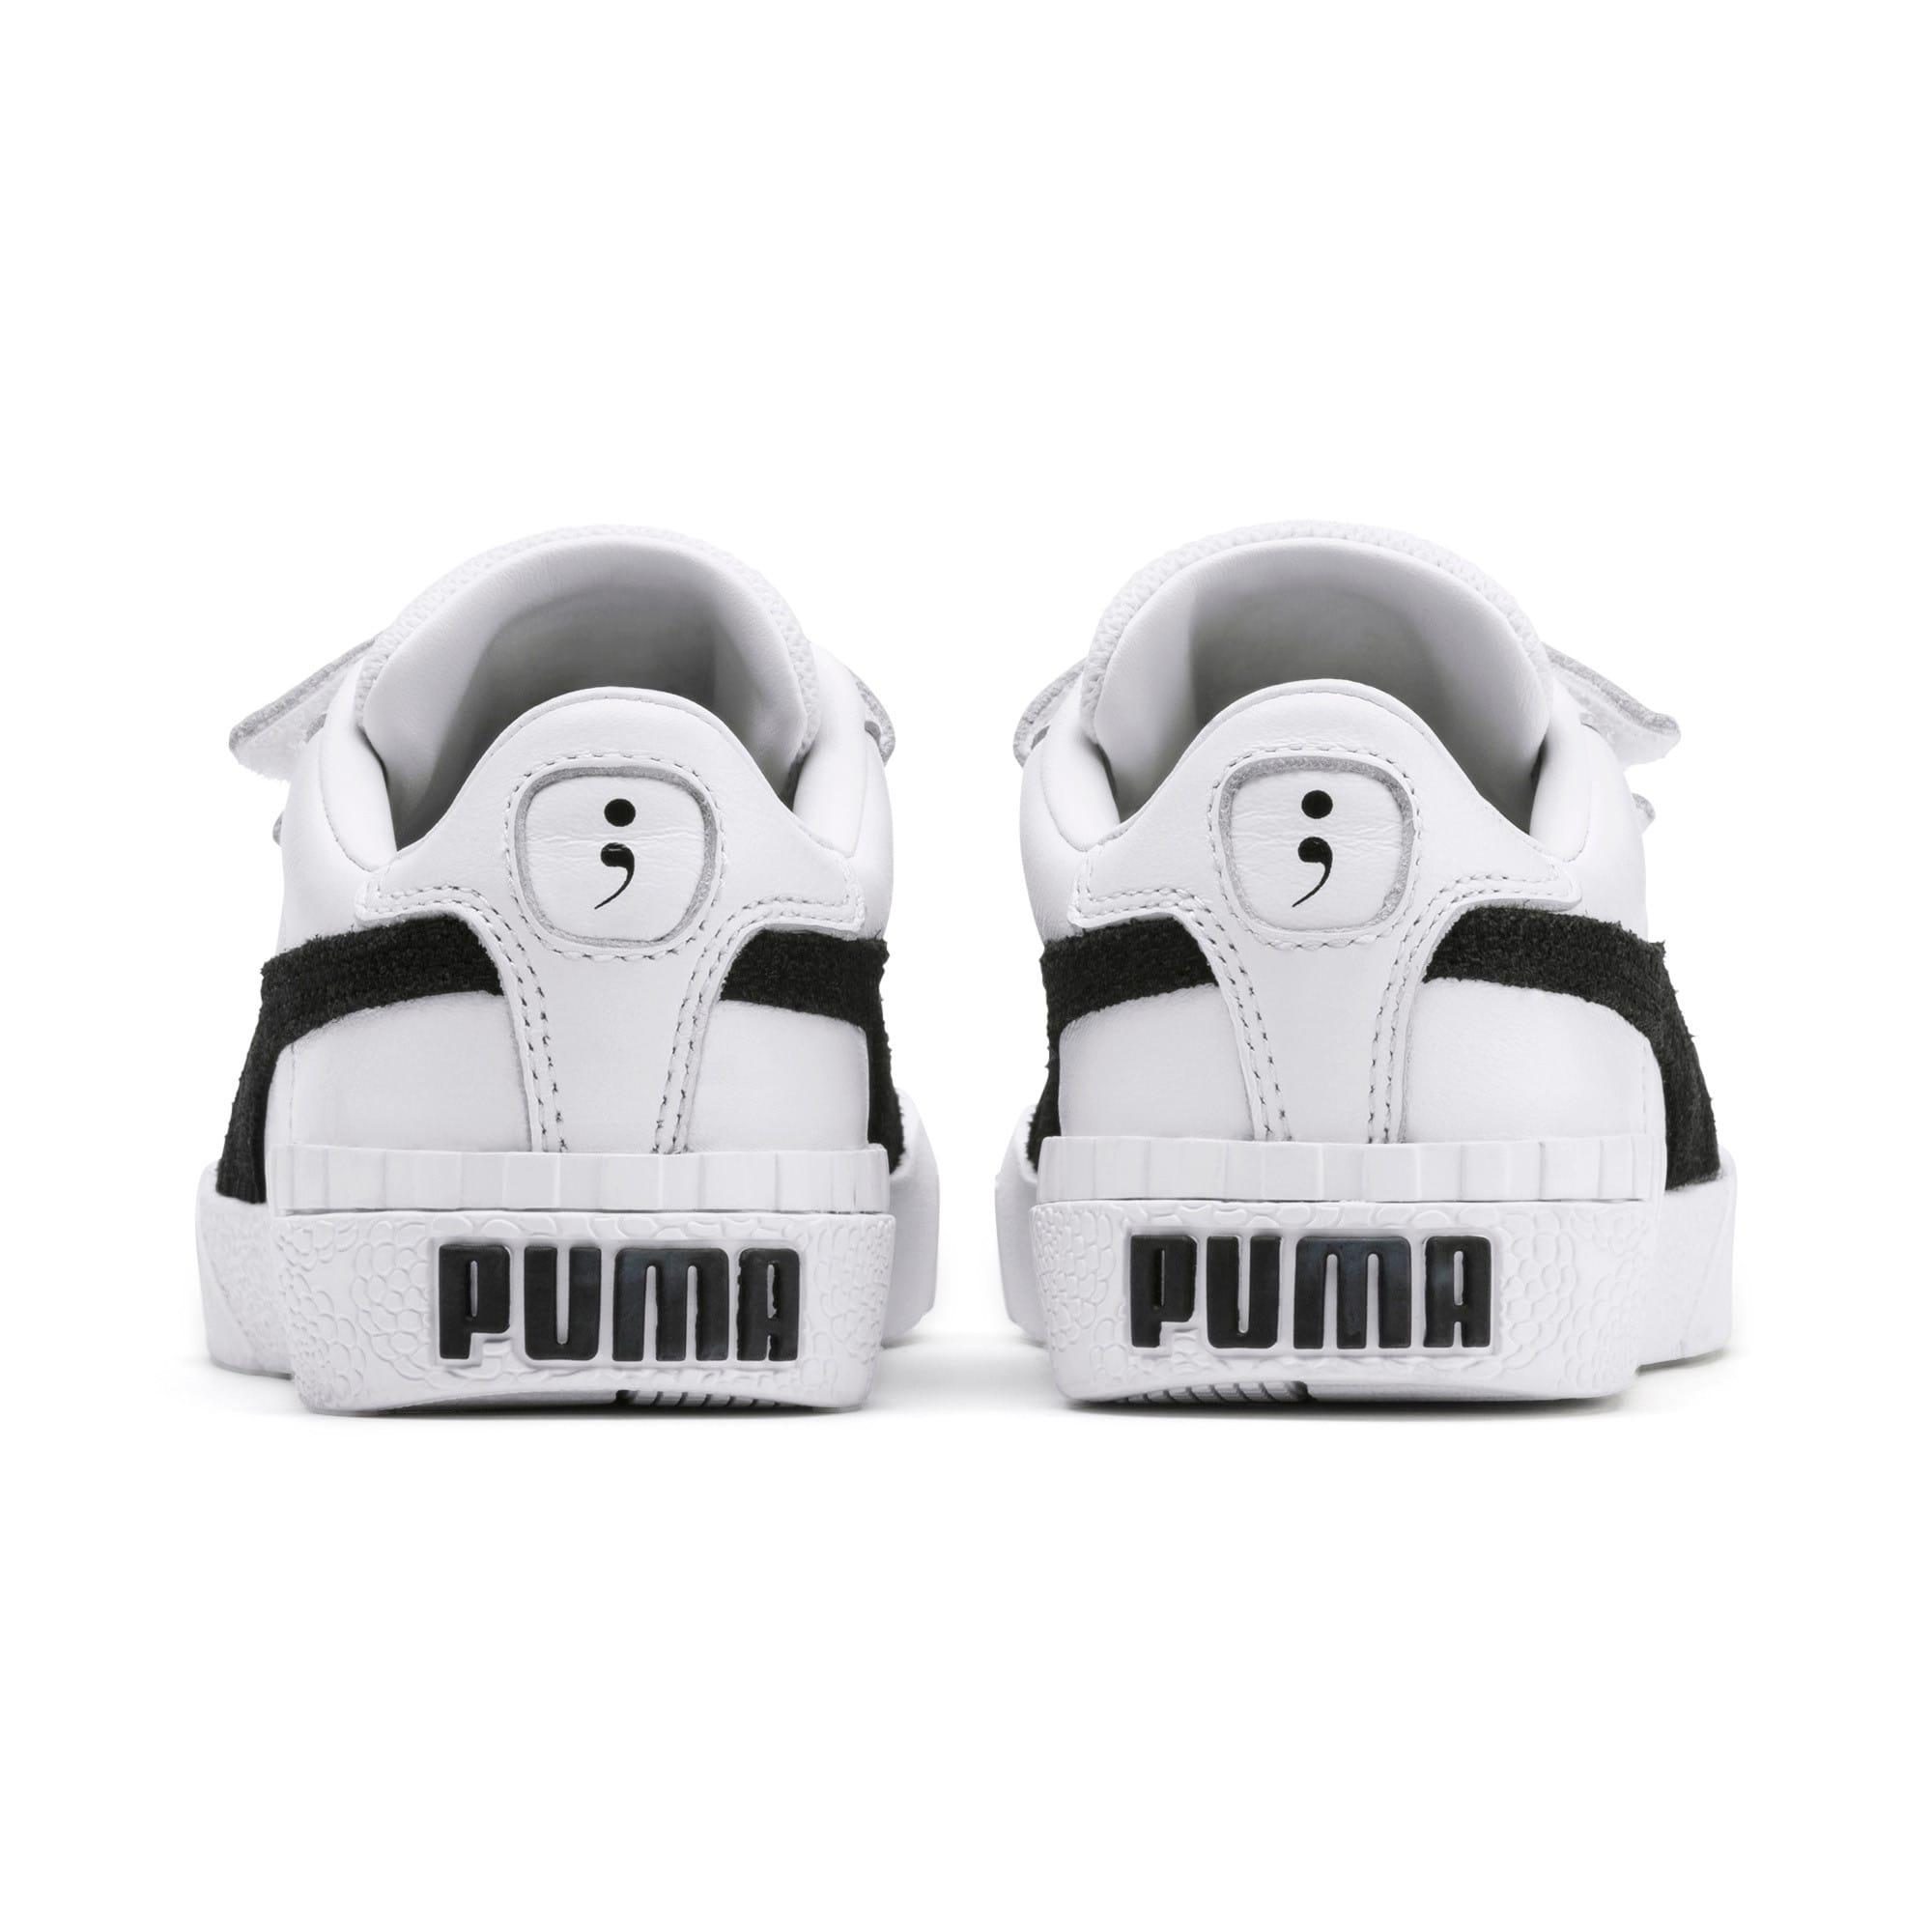 Thumbnail 3 of PUMA x Selena Gomez Kids' Cali B&W Trainers, Puma White-Puma Black, medium